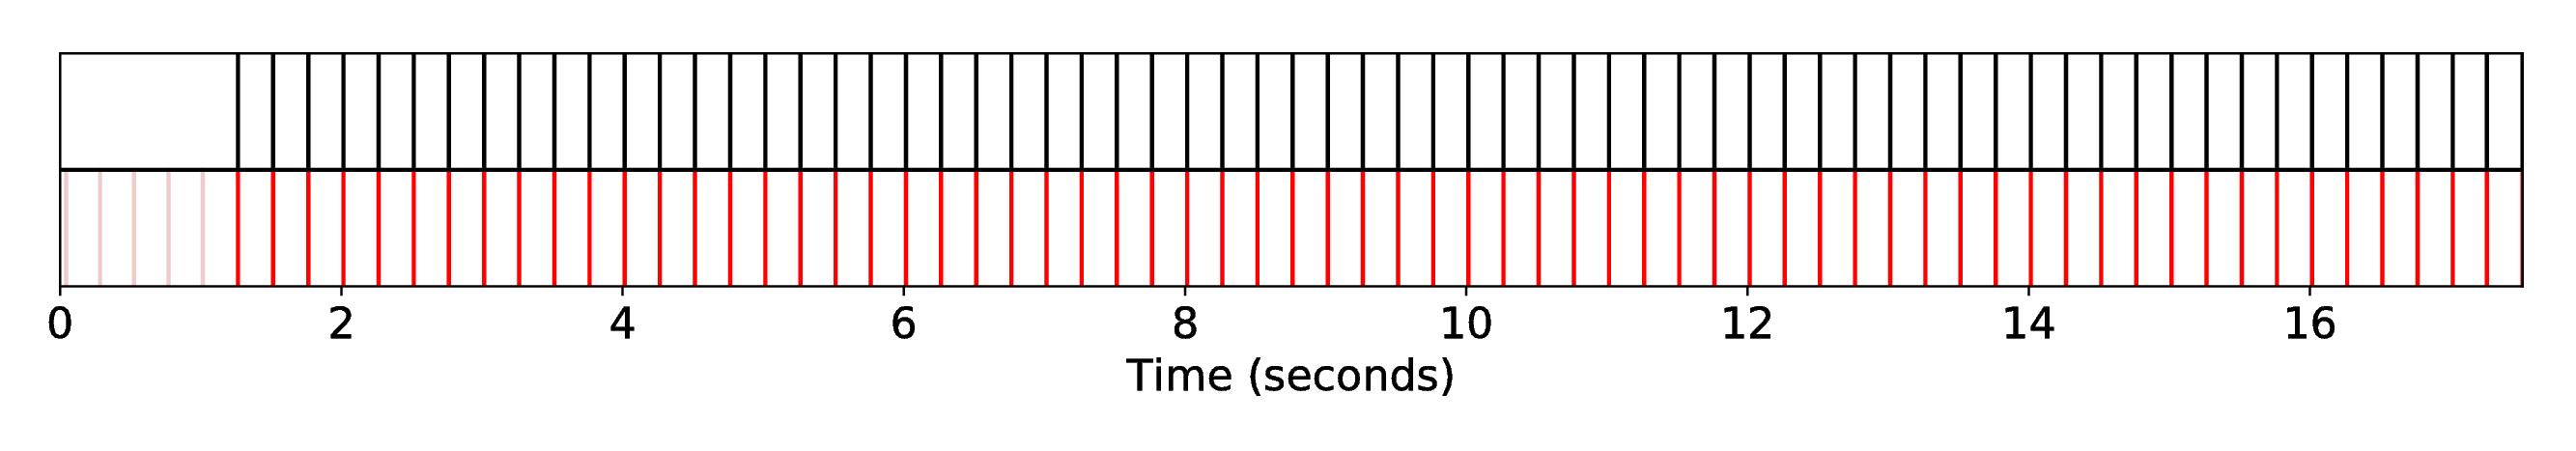 DP1_INT1_R-MRI-20__S-Fandango__SequenceAlignment